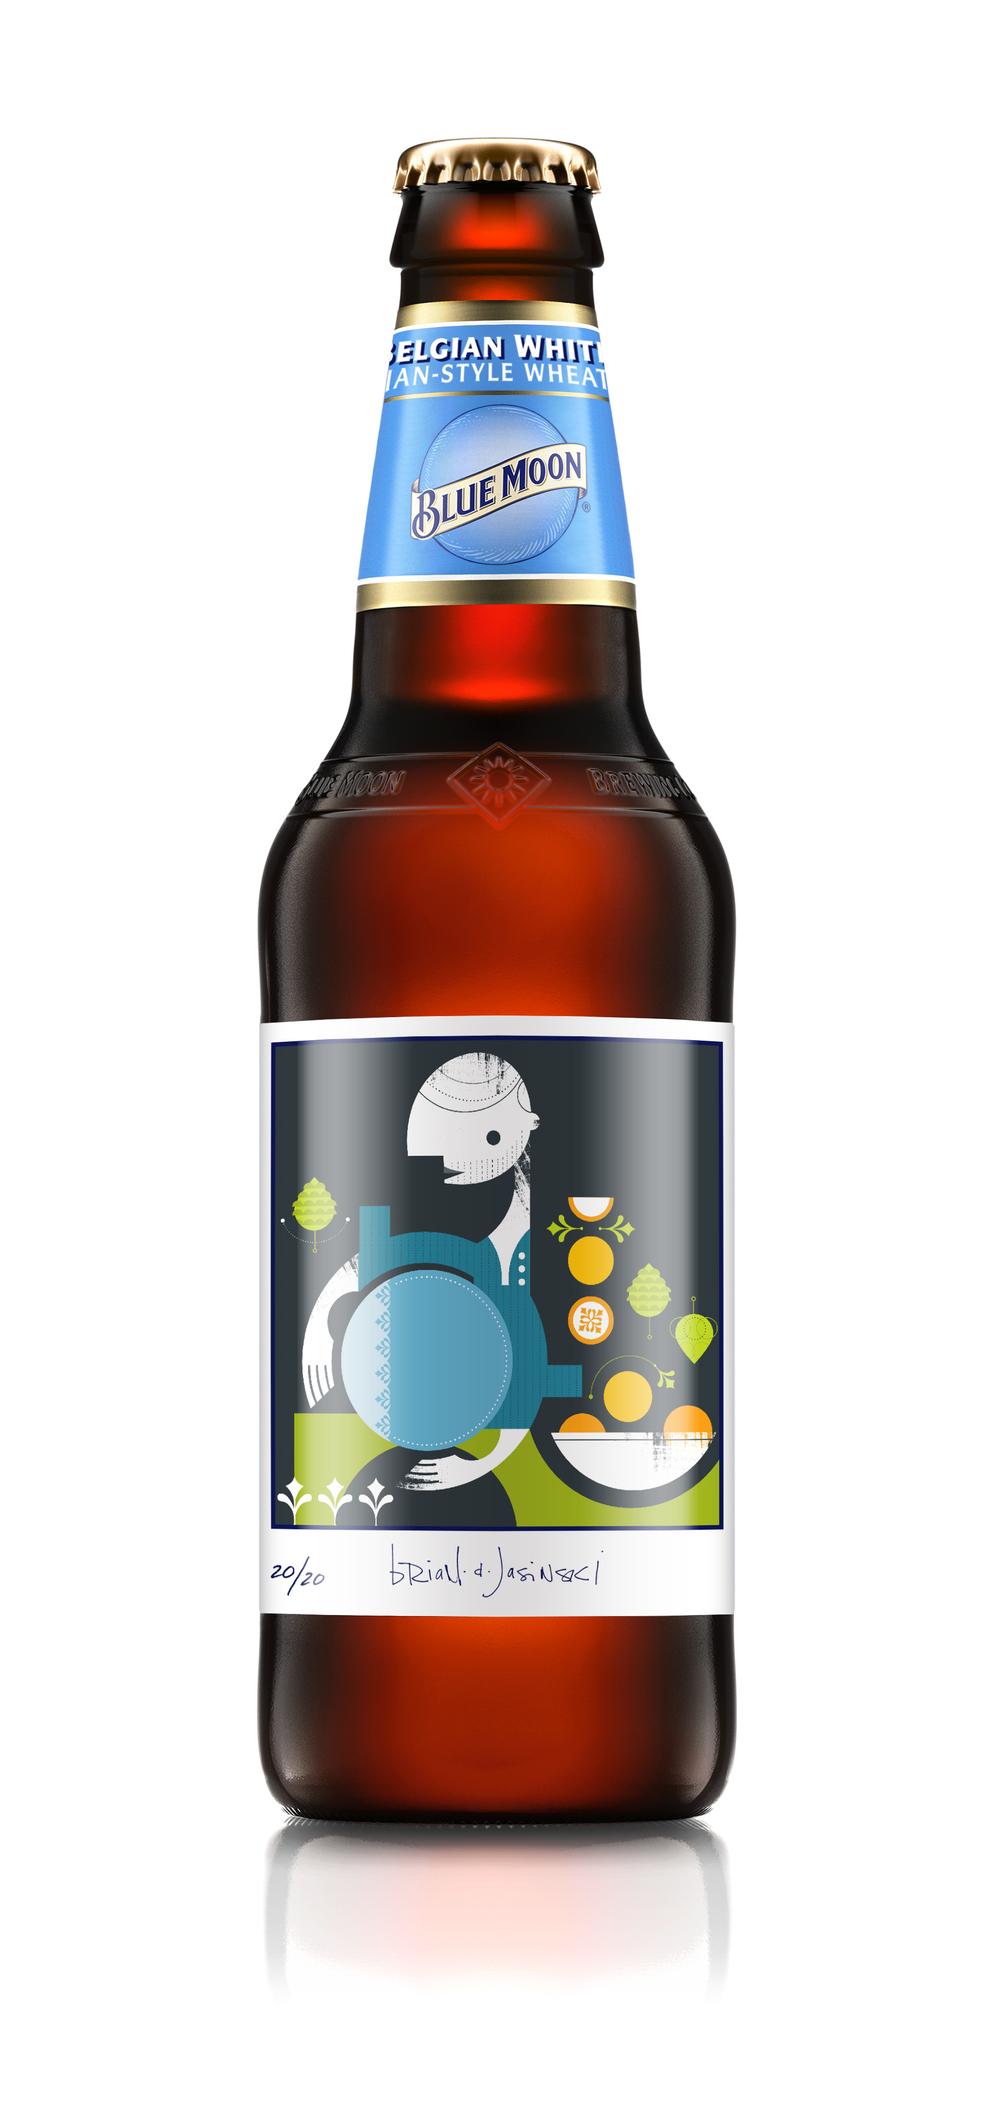 BMO-195A_Bottle_12z_Render_BrianAndrewJasinski_150401_FJ.jpg